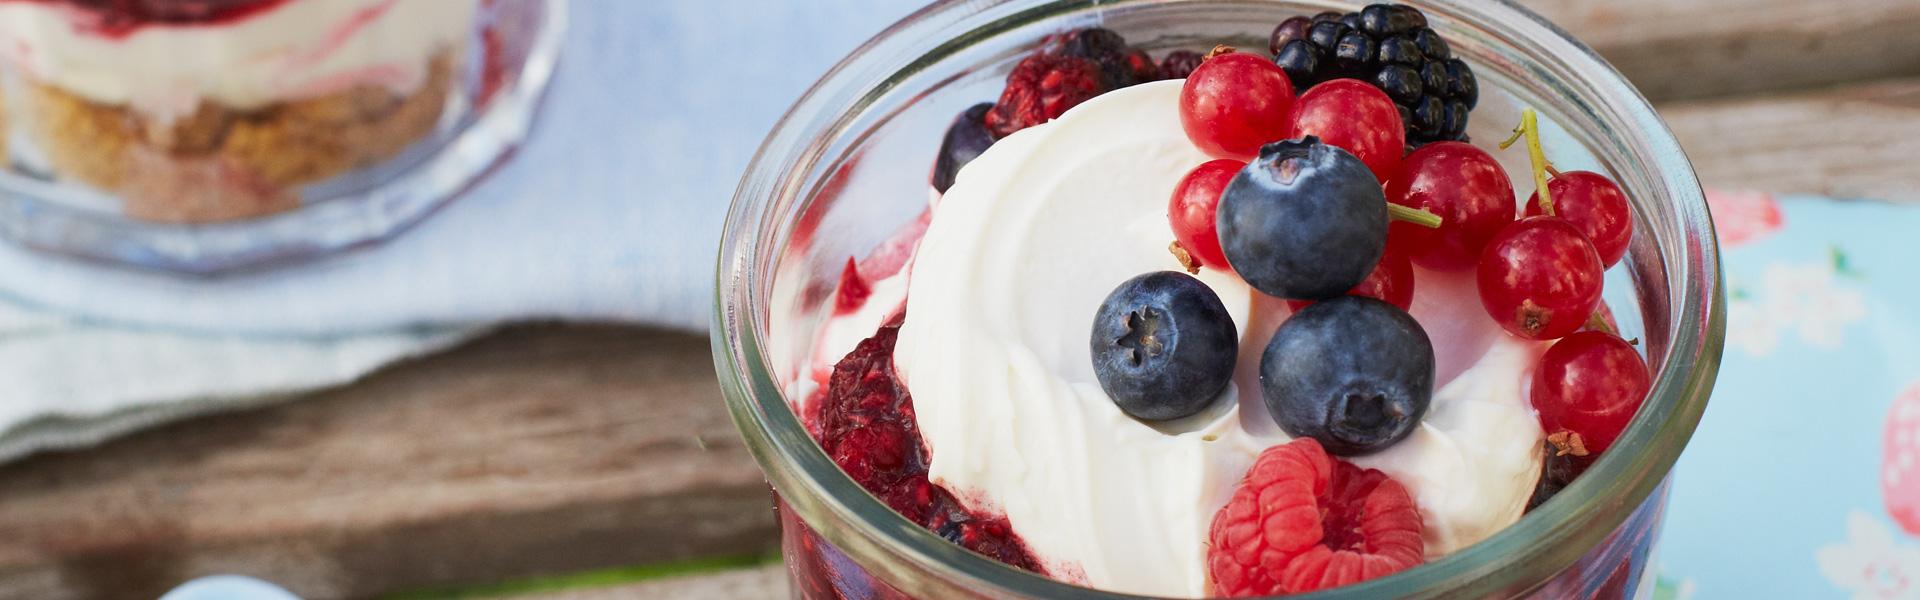 Cath Kidston: Berry Cheesecake Jars Recipe